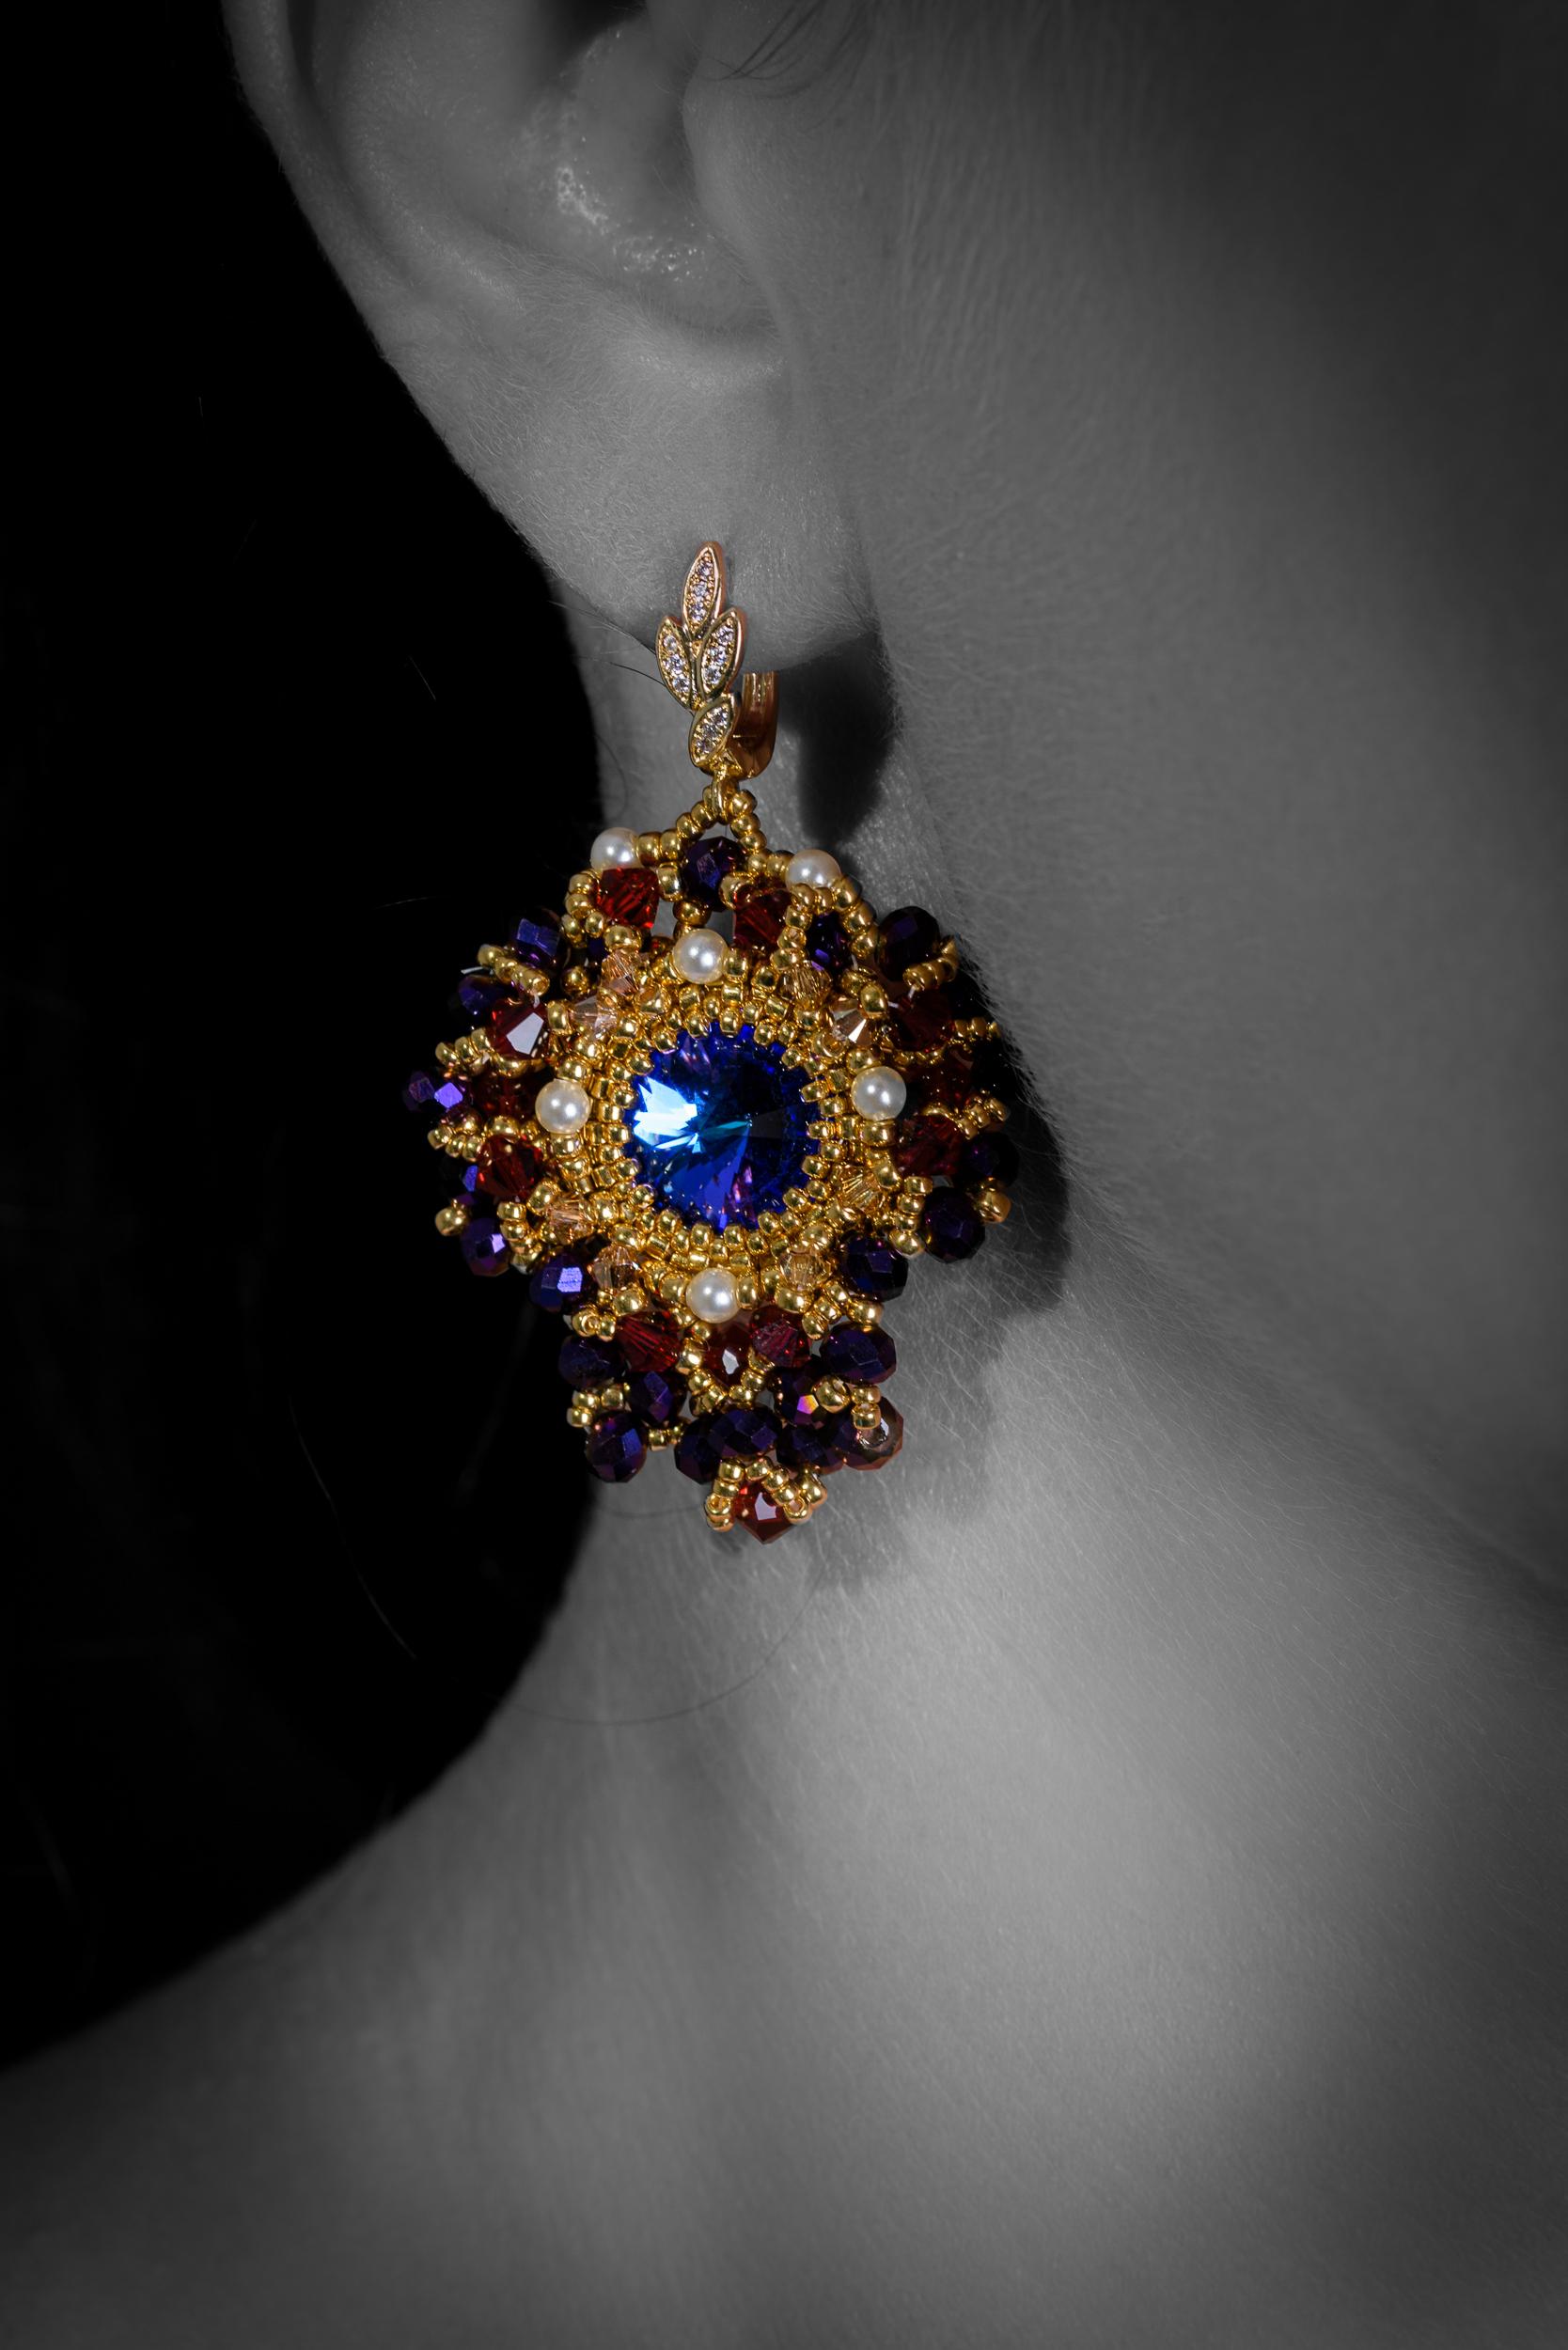 Nadezda Pluksne Jewellery-9.jpg